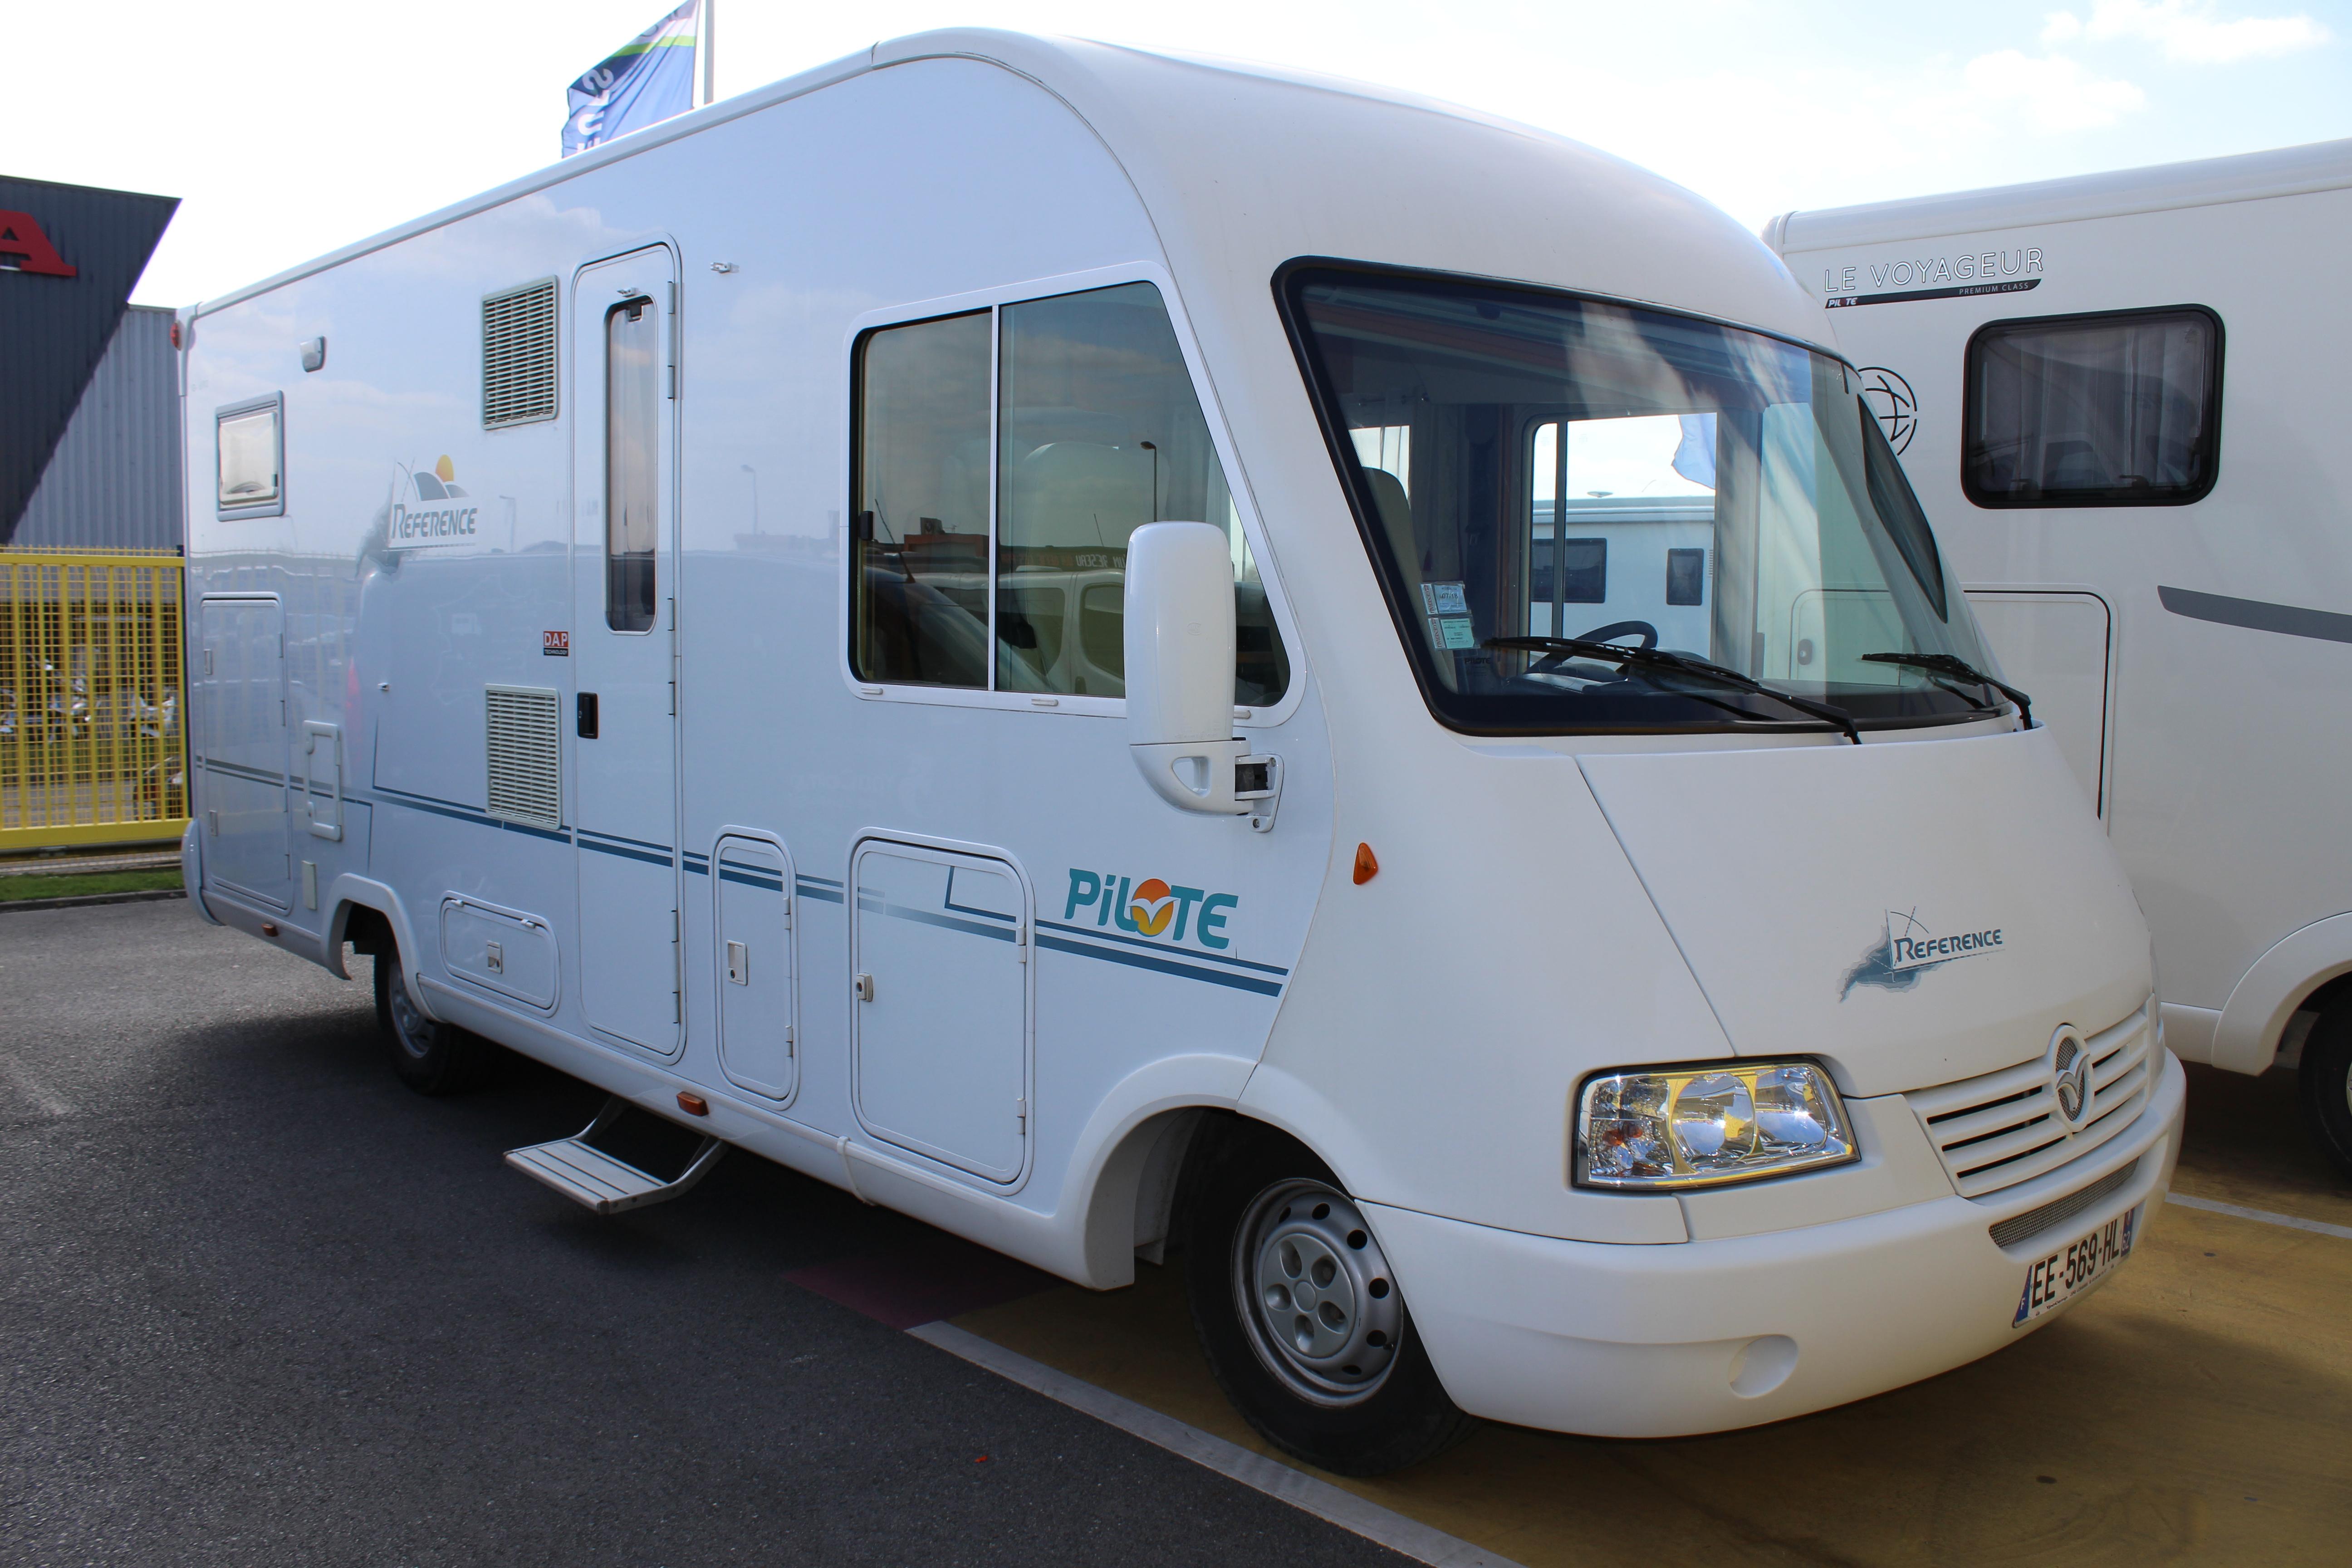 pilote reference g 692 occasion de 2005 citroen camping car en vente seclin nord 59. Black Bedroom Furniture Sets. Home Design Ideas